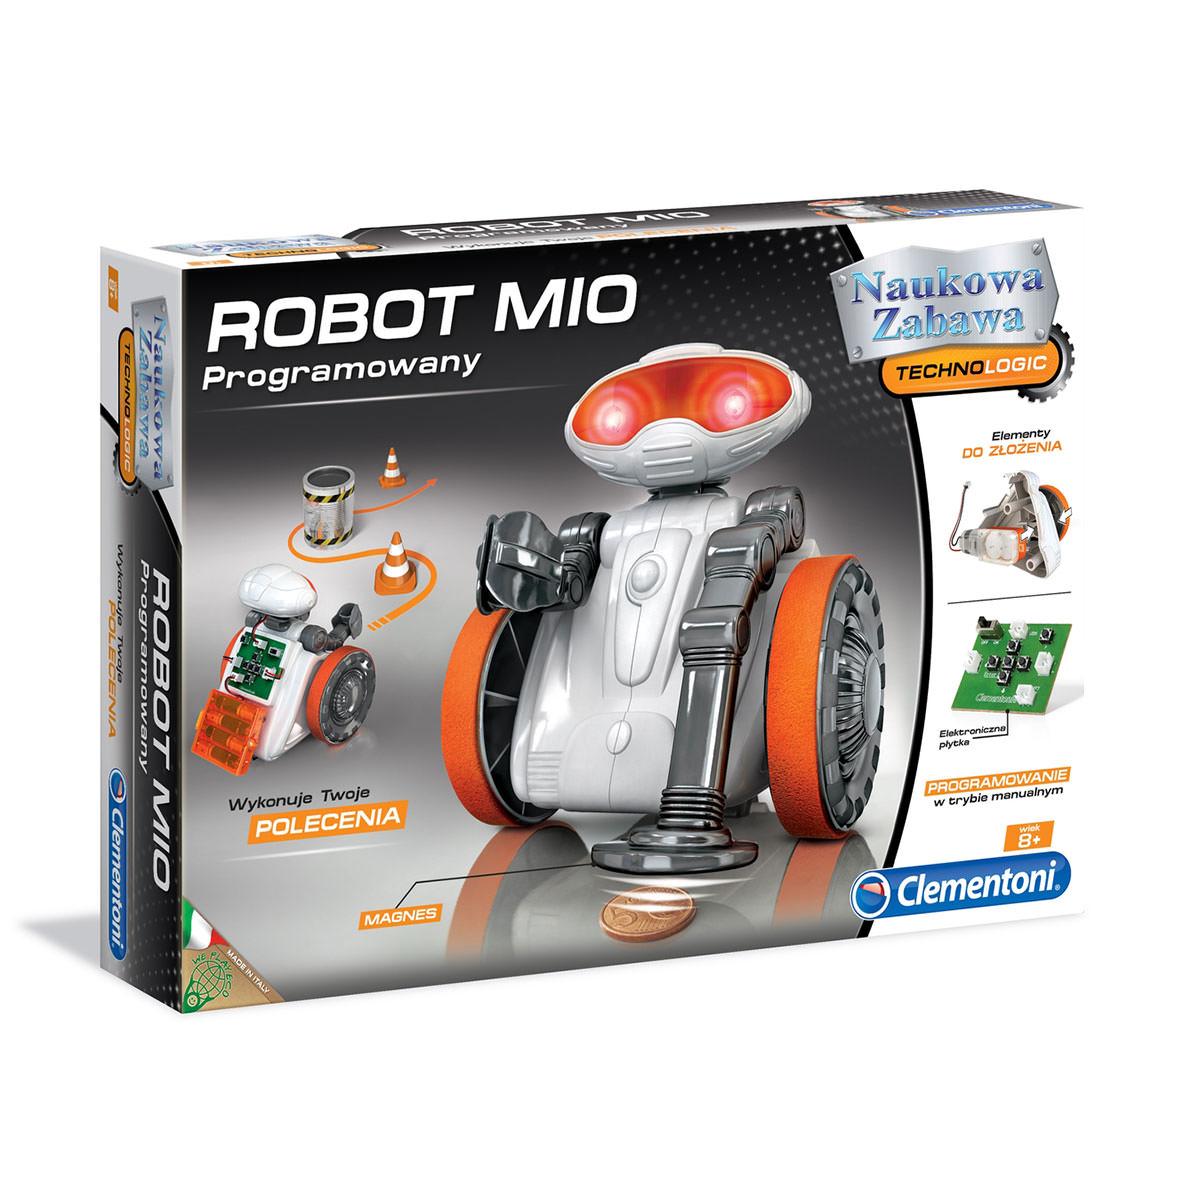 Clementoni MIO the Robot at Hobby Warehouse